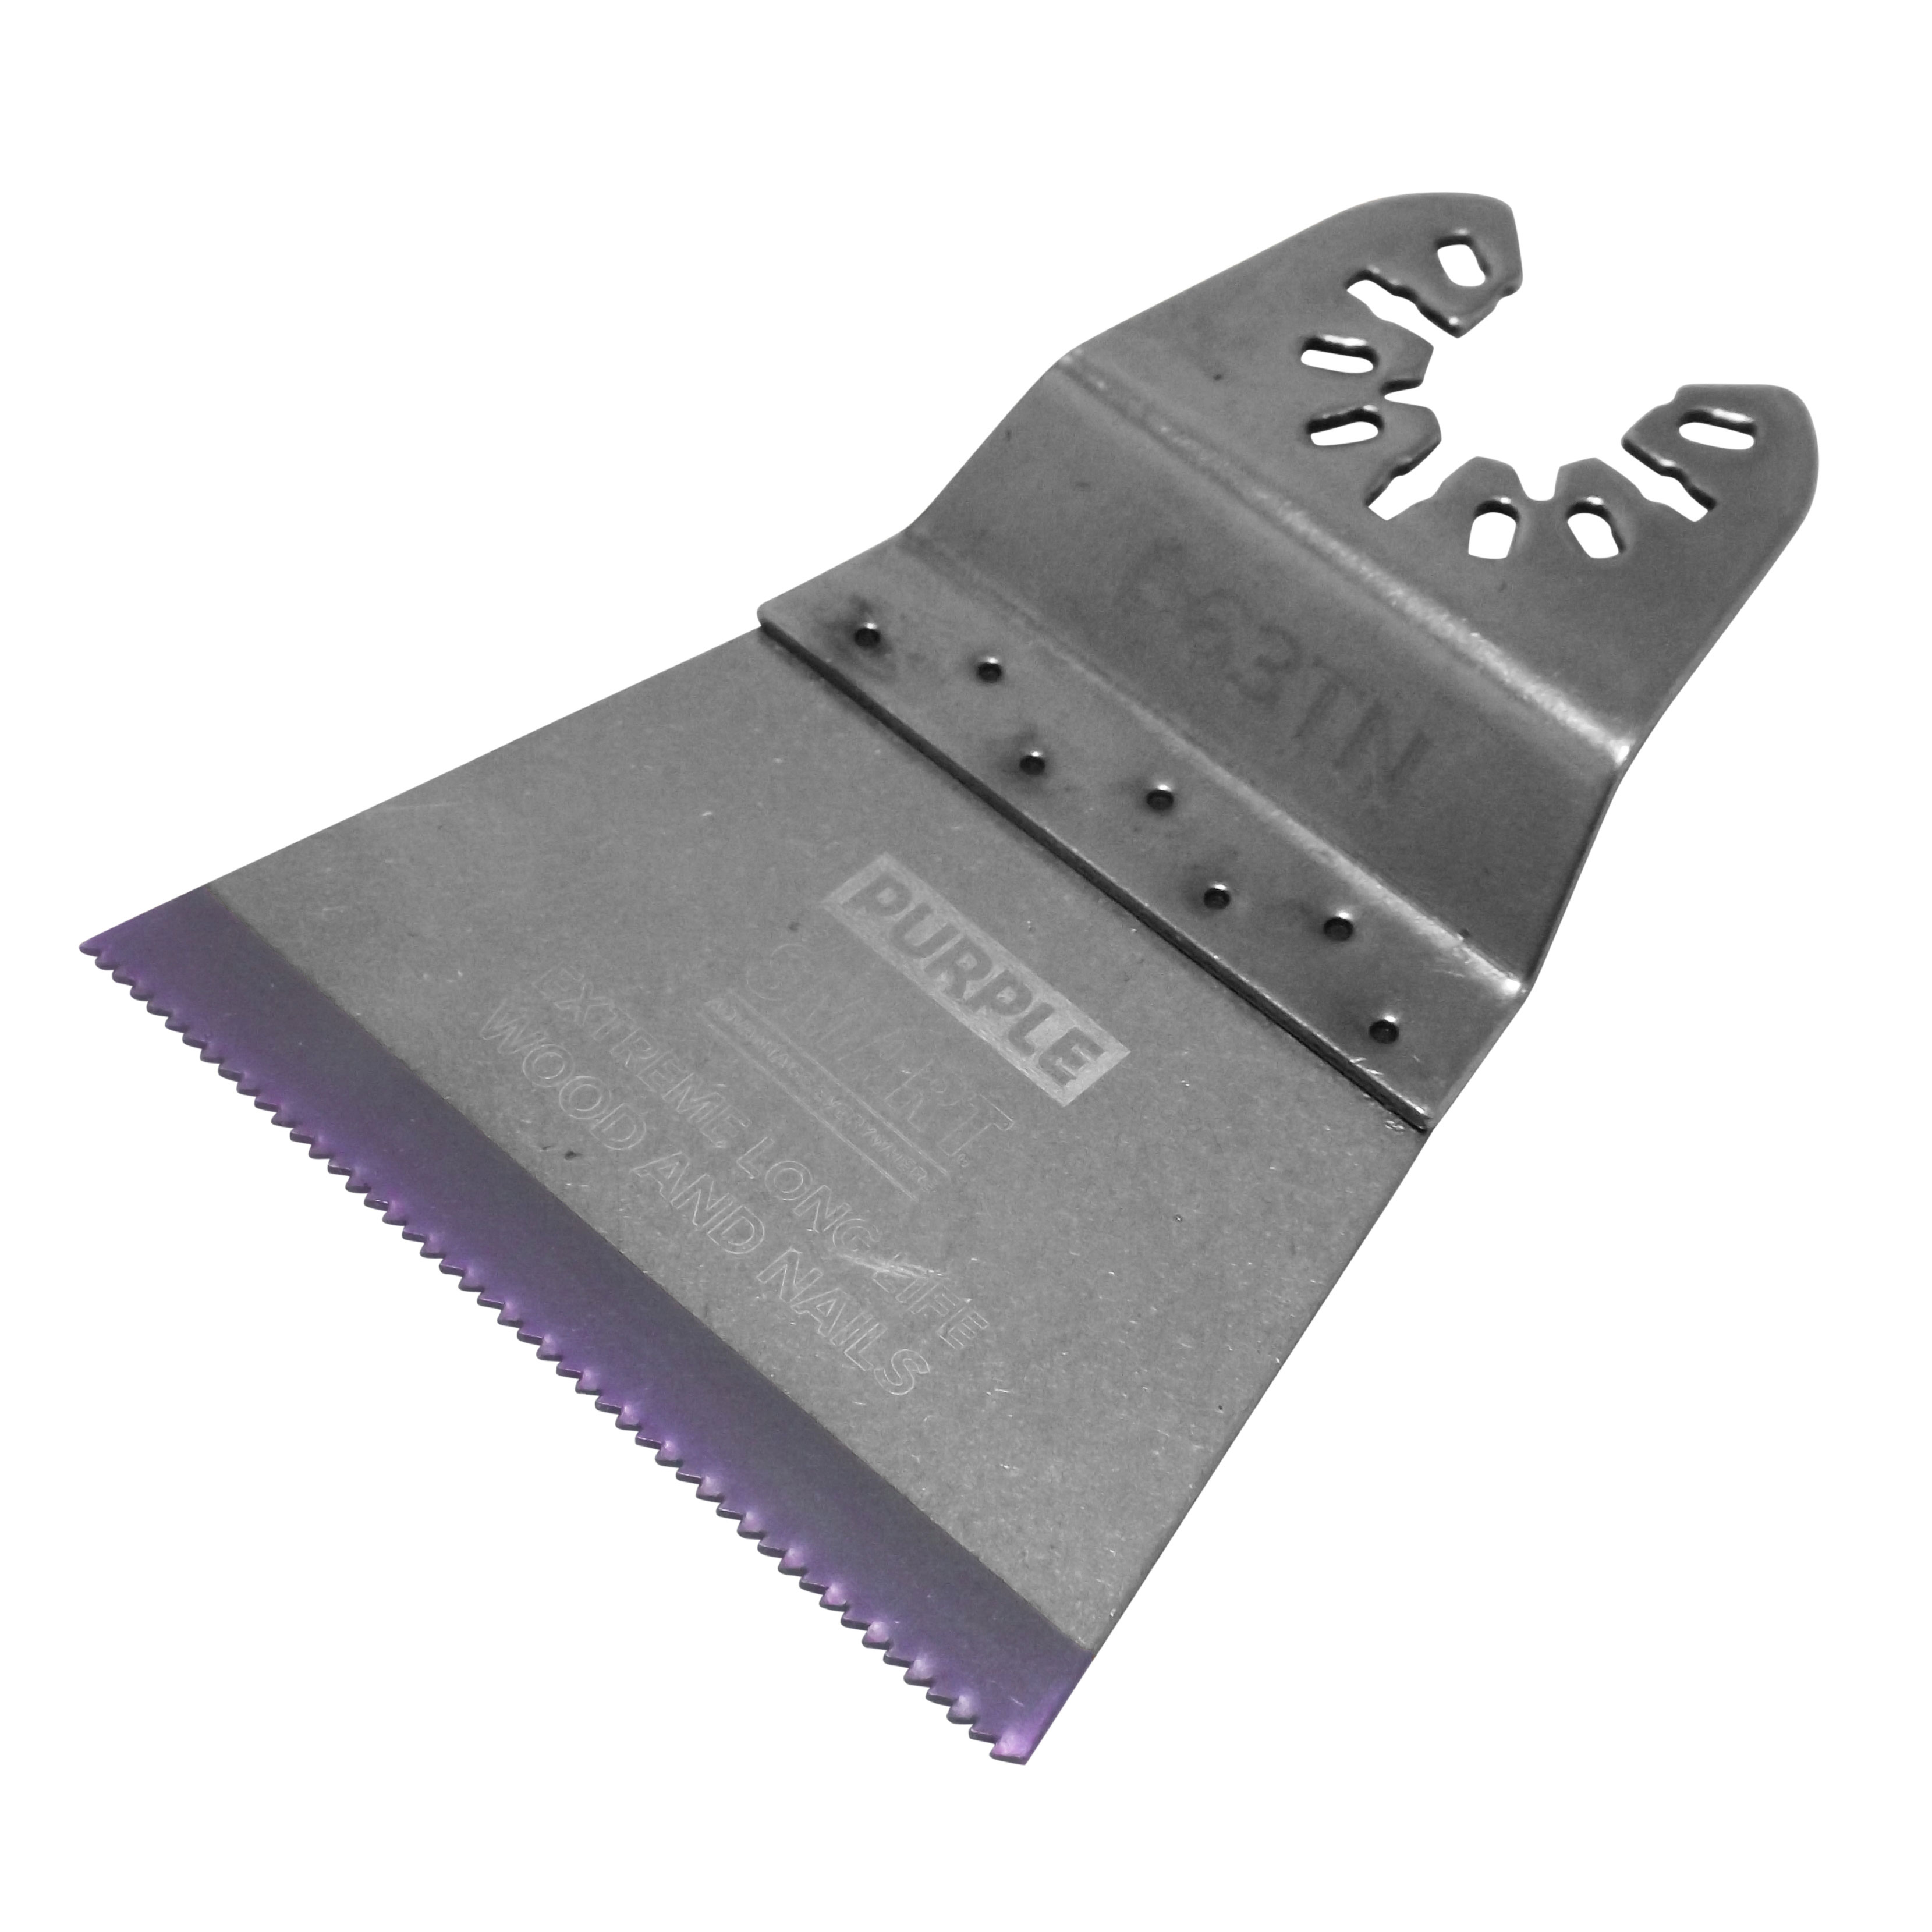 Multiverktyg OX Tools Bi-metall Lila